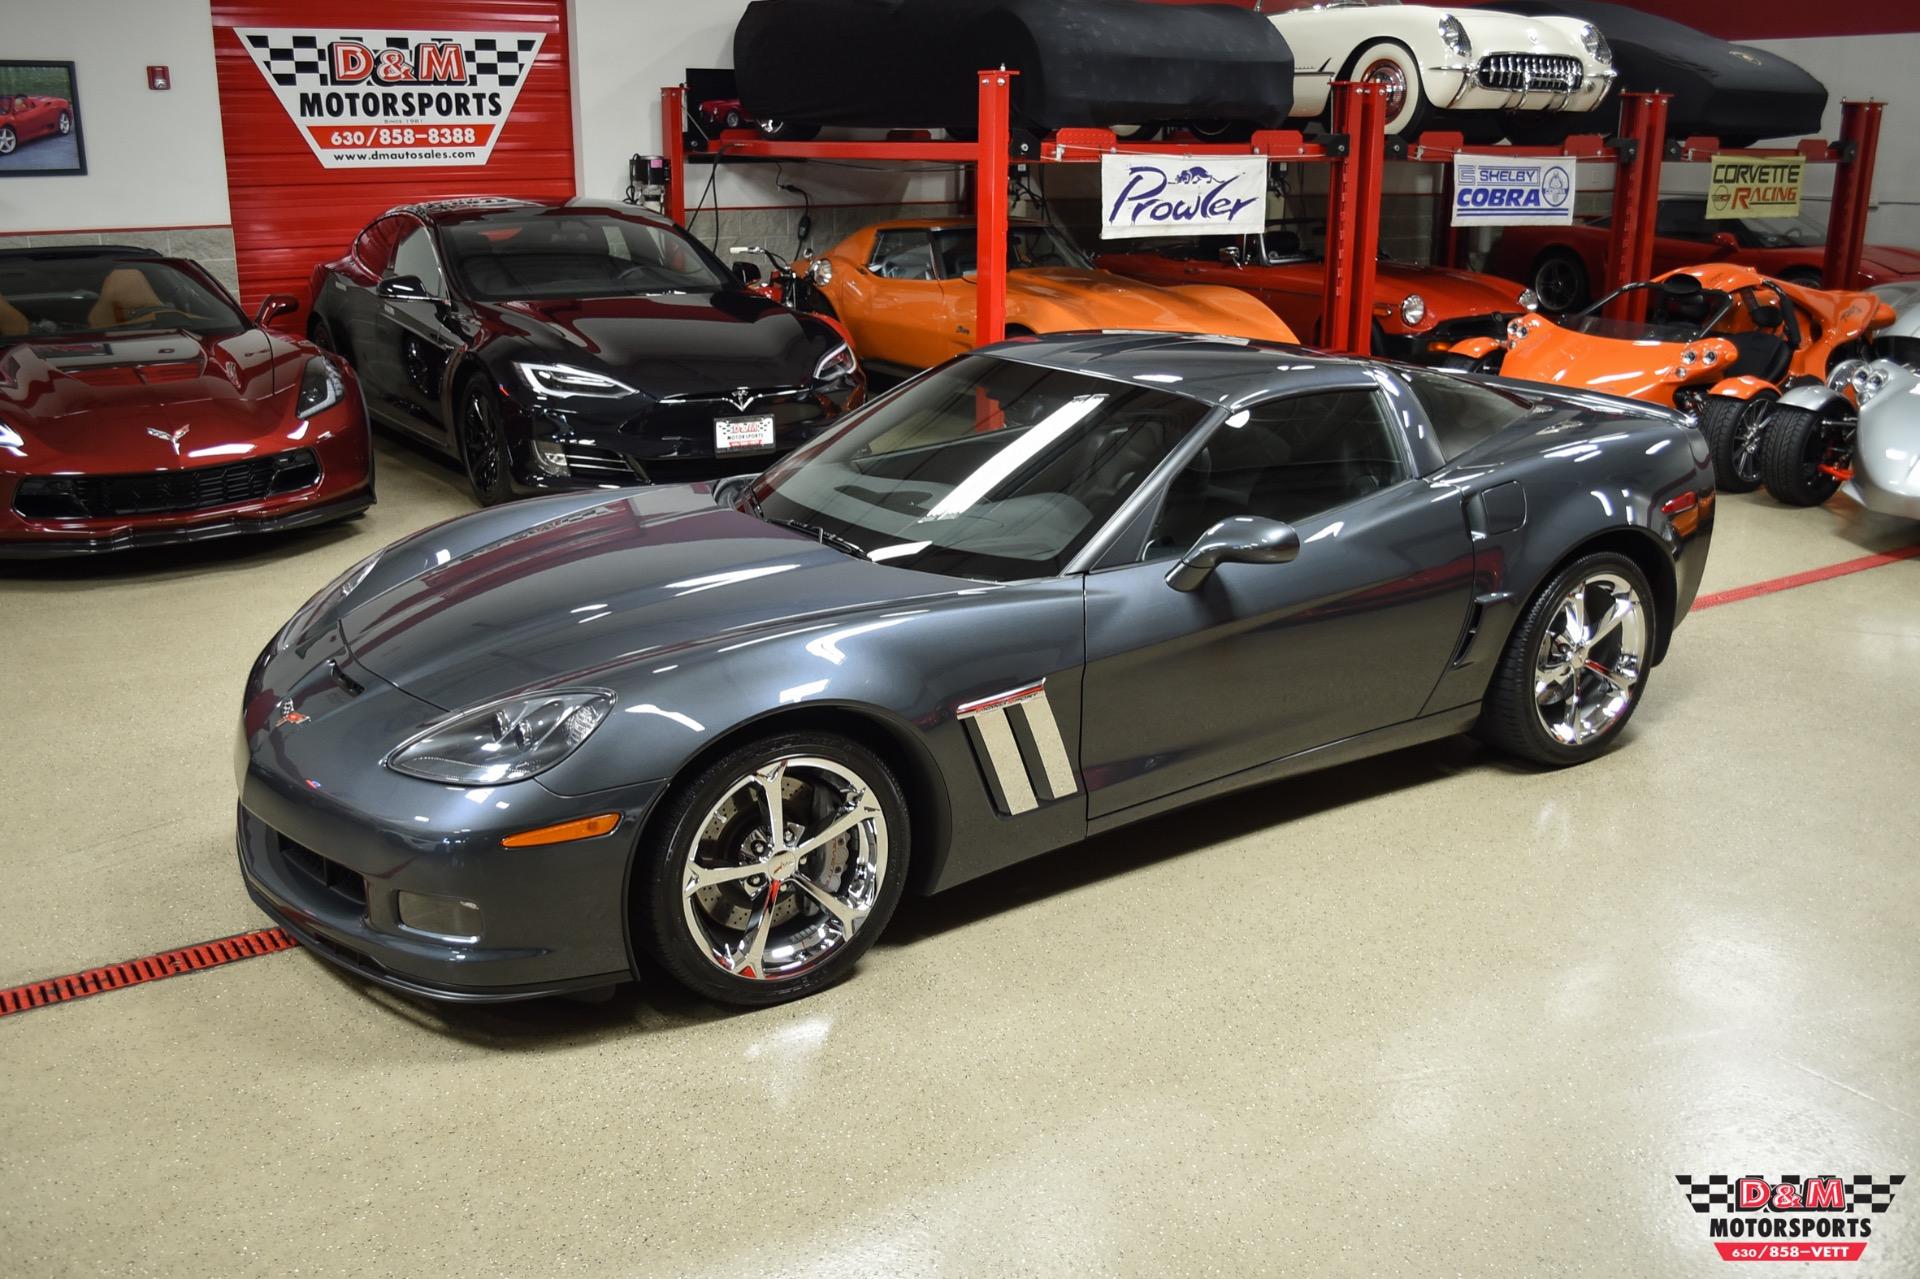 Used 2012 Chevrolet Corvette Grand Sport Coupe | Glen Ellyn, IL